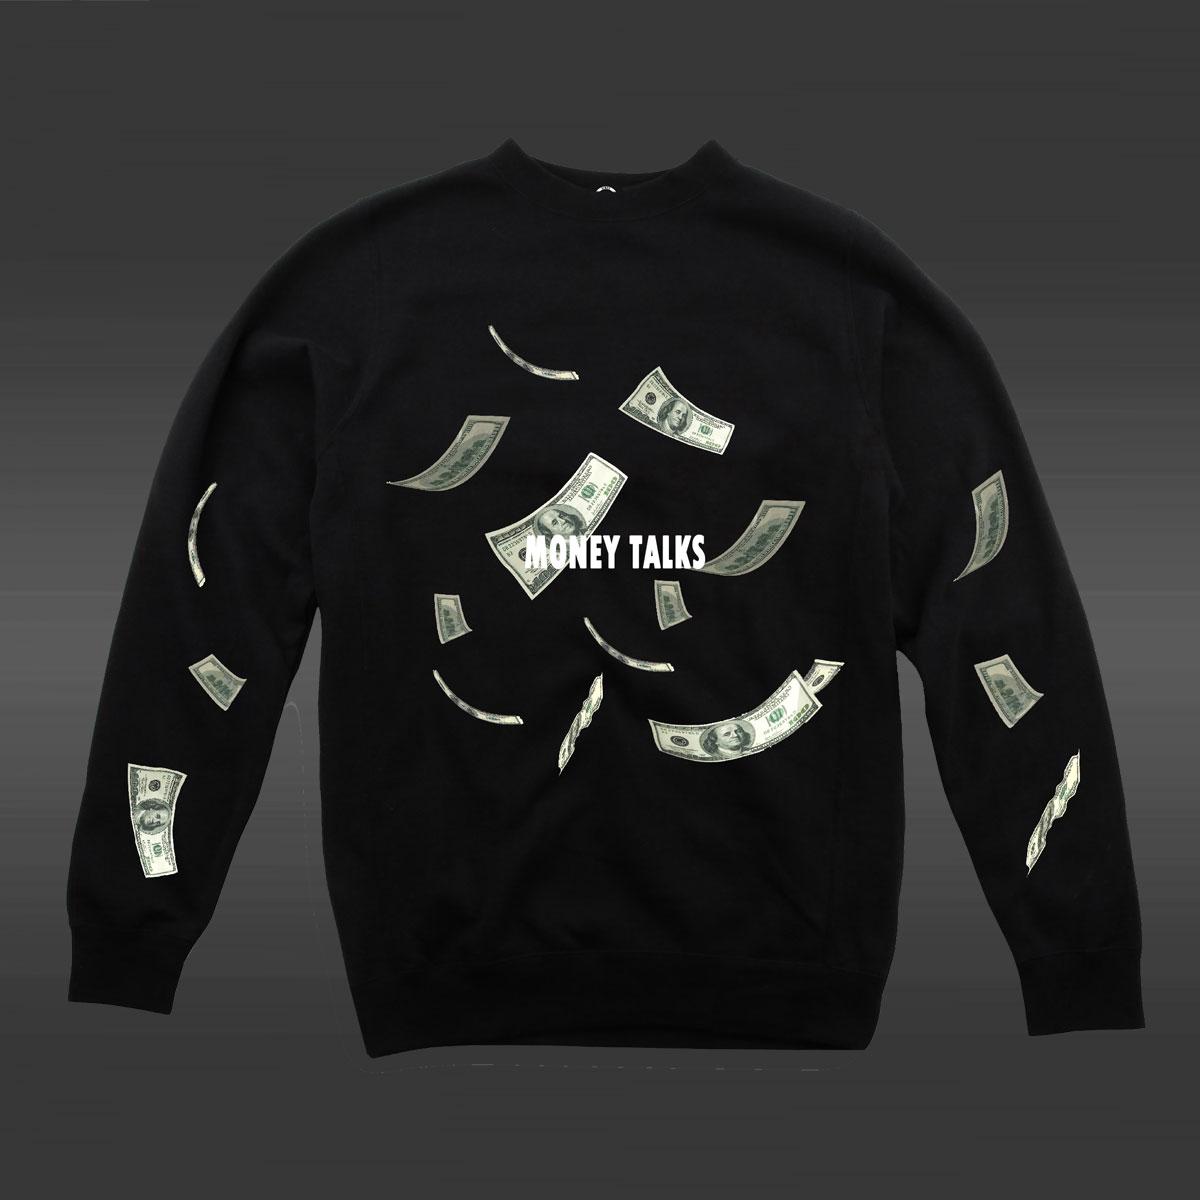 Money Talks Crew Neck Sweater - Black